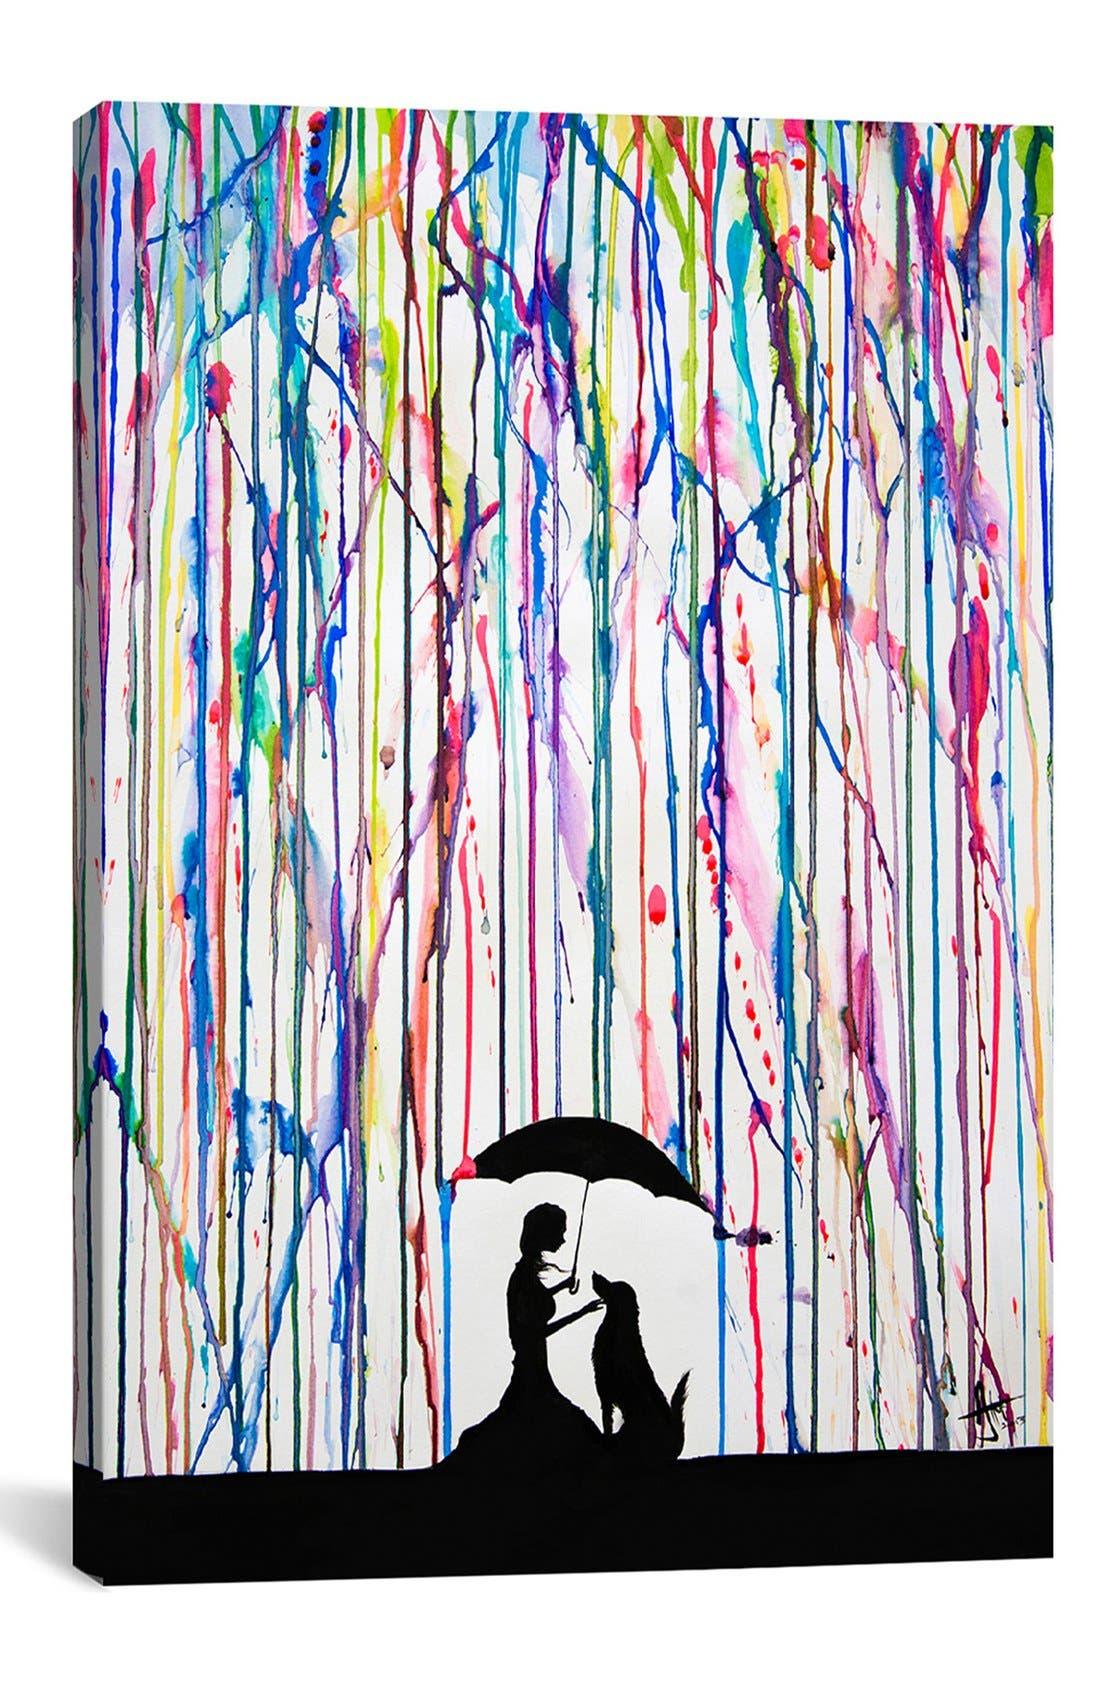 Alternate Image 1 Selected - iCanvas 'Sempre' Giclée Print Canvas Art